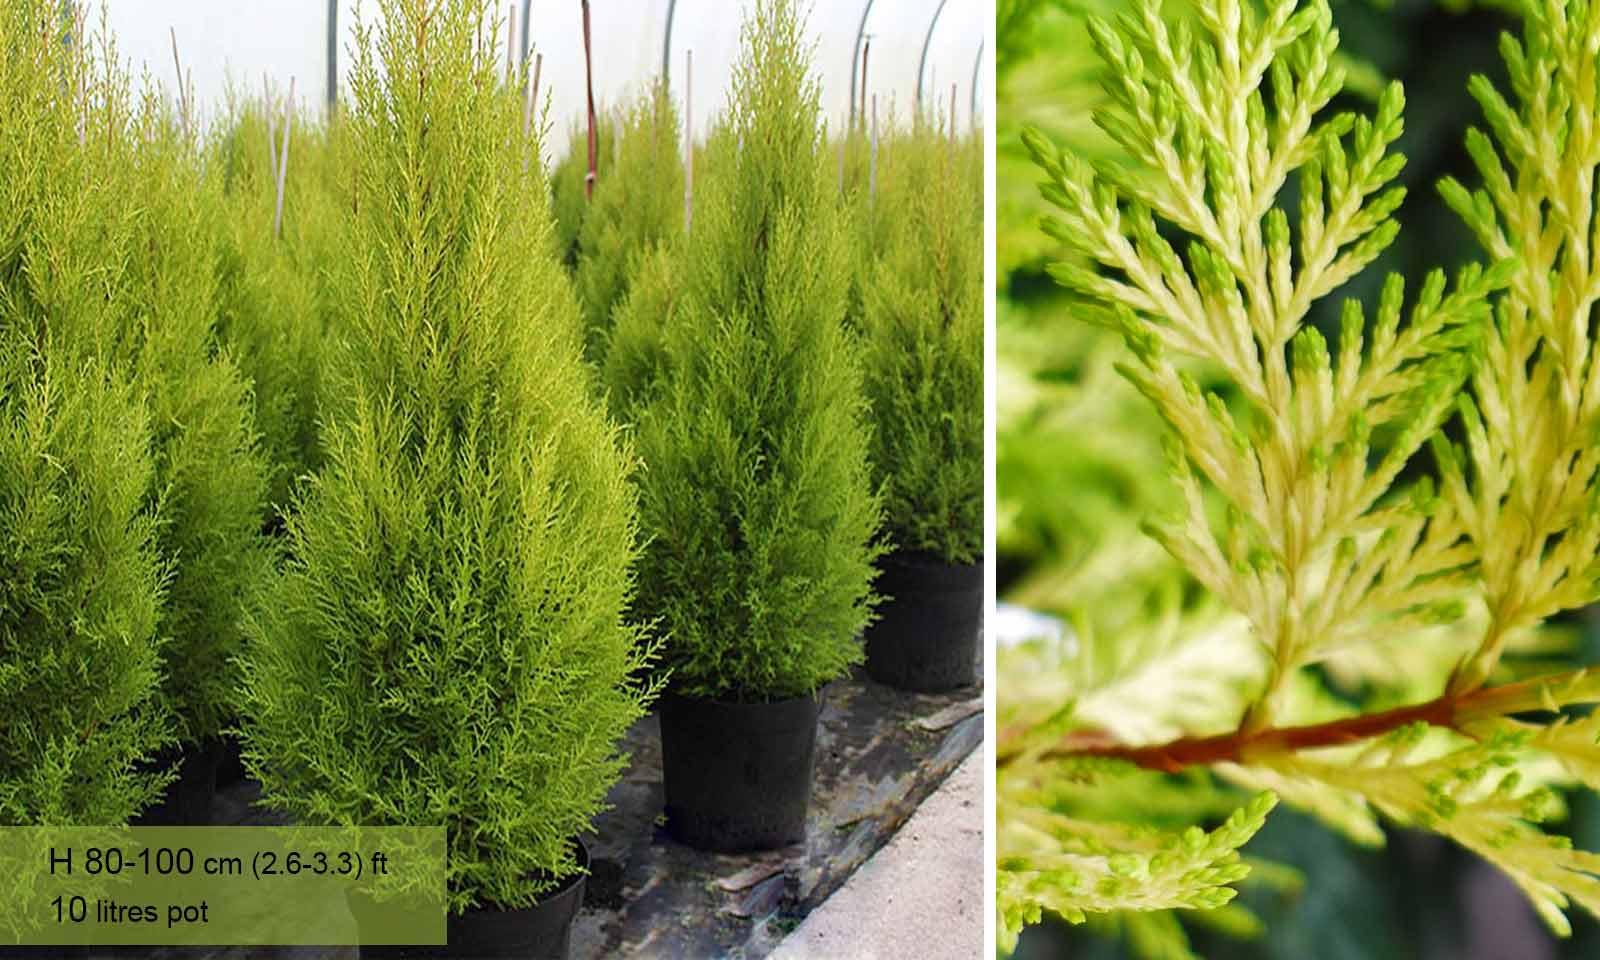 Cupressus Macrocarpa Goldcrest (Monterey Cypress, Goldcrest Cypress) - Garden Plants Online